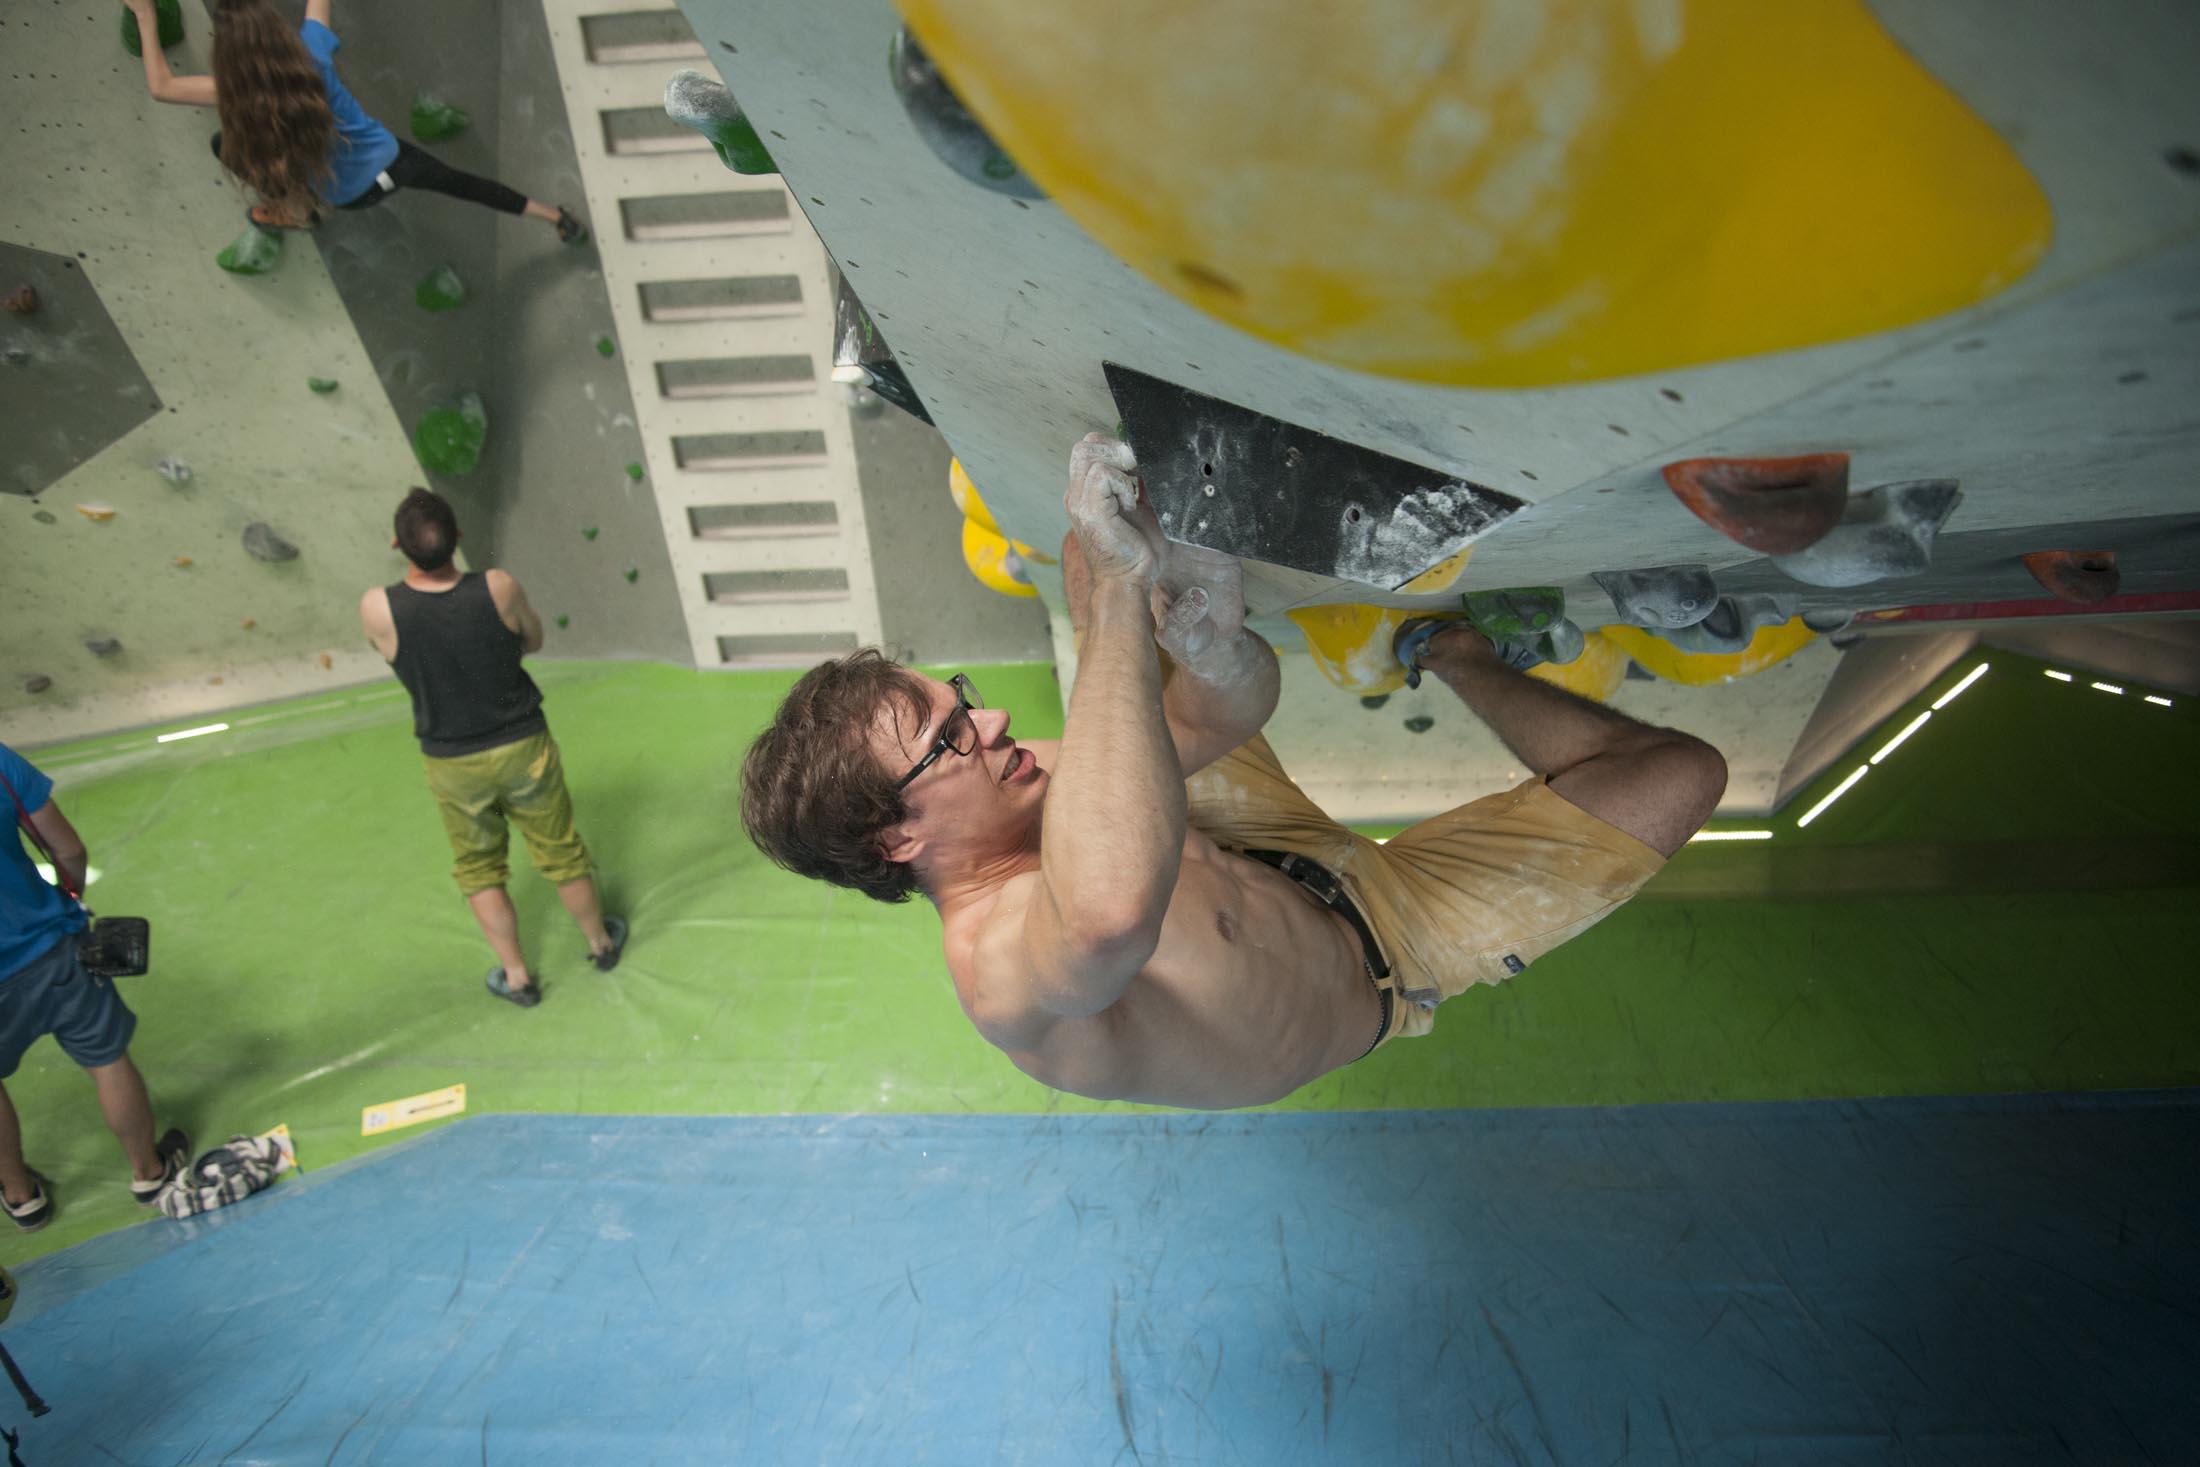 Quali, internationaler bouldercup Frankenjura 2016, BLOCKHELDEN Erlangen, Mammut, Bergfreunde.de, Boulderwettkampf07092016244